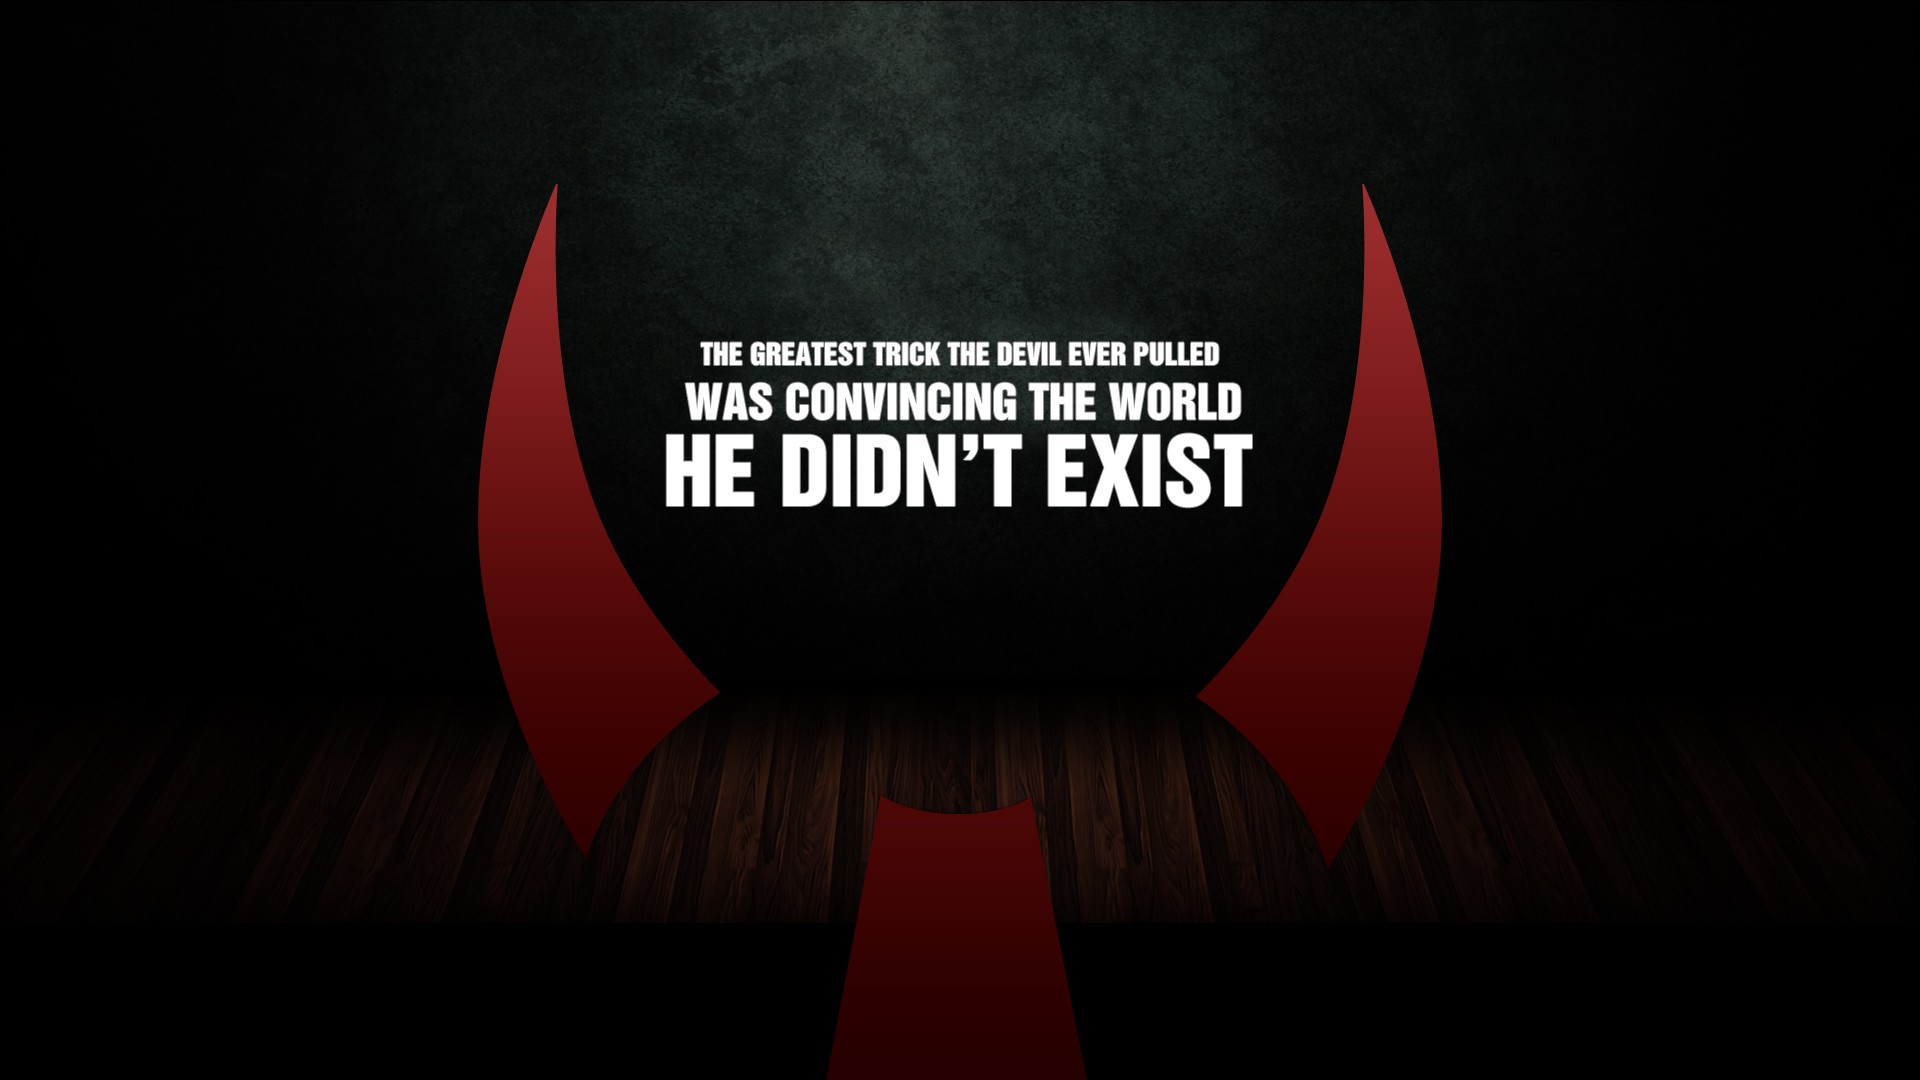 Devil quote #4